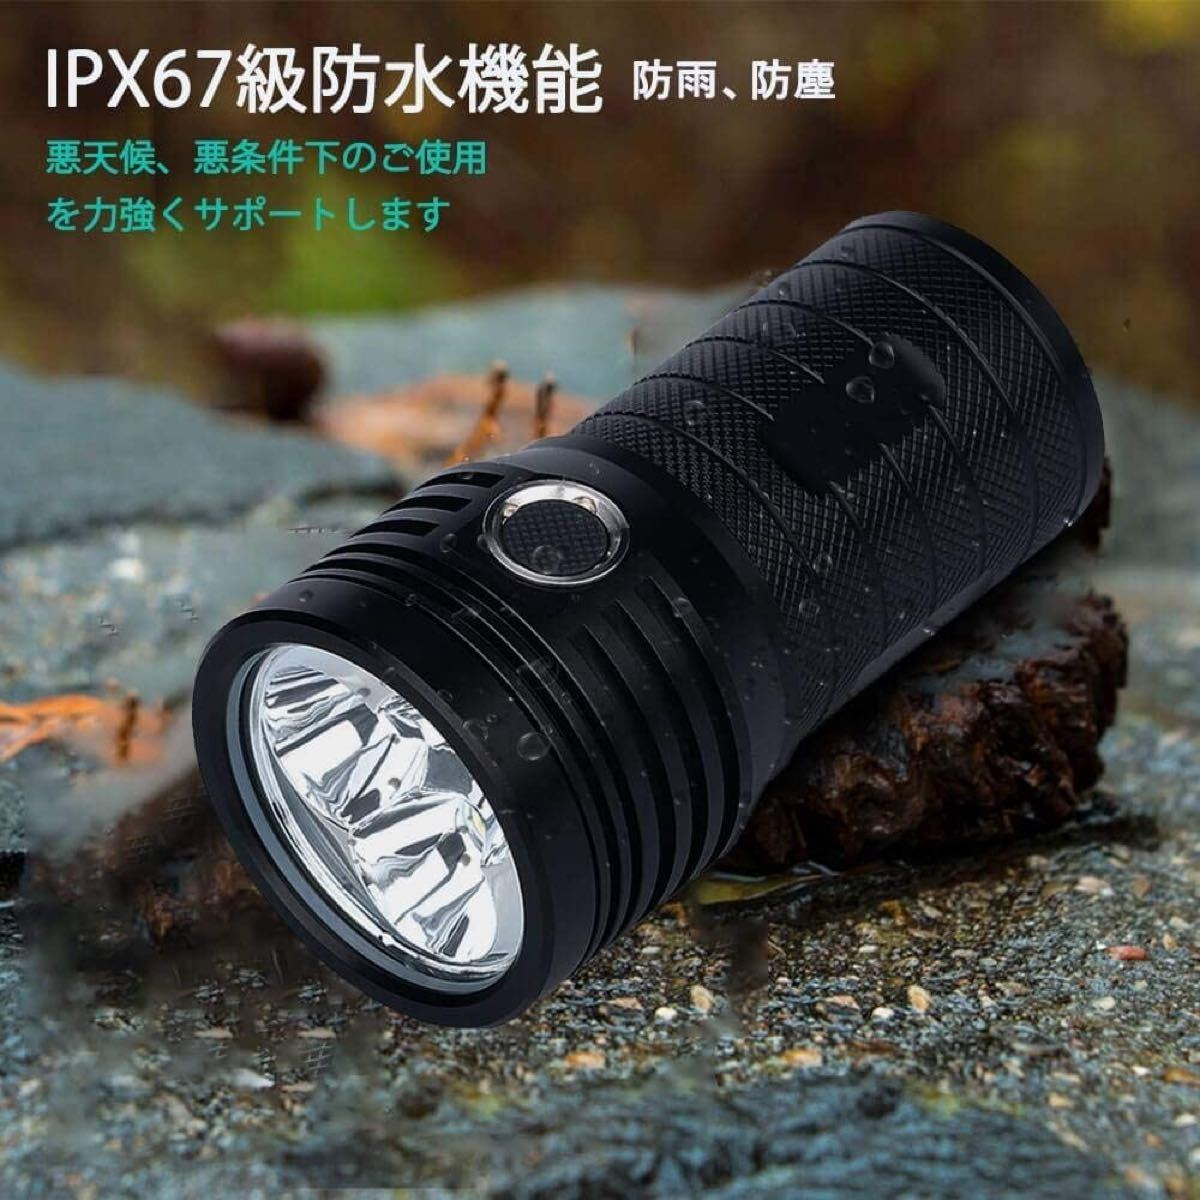 LED 懐中電灯 強力 軍用 最強 小型 USB充電式超高輝度10000ルーメン